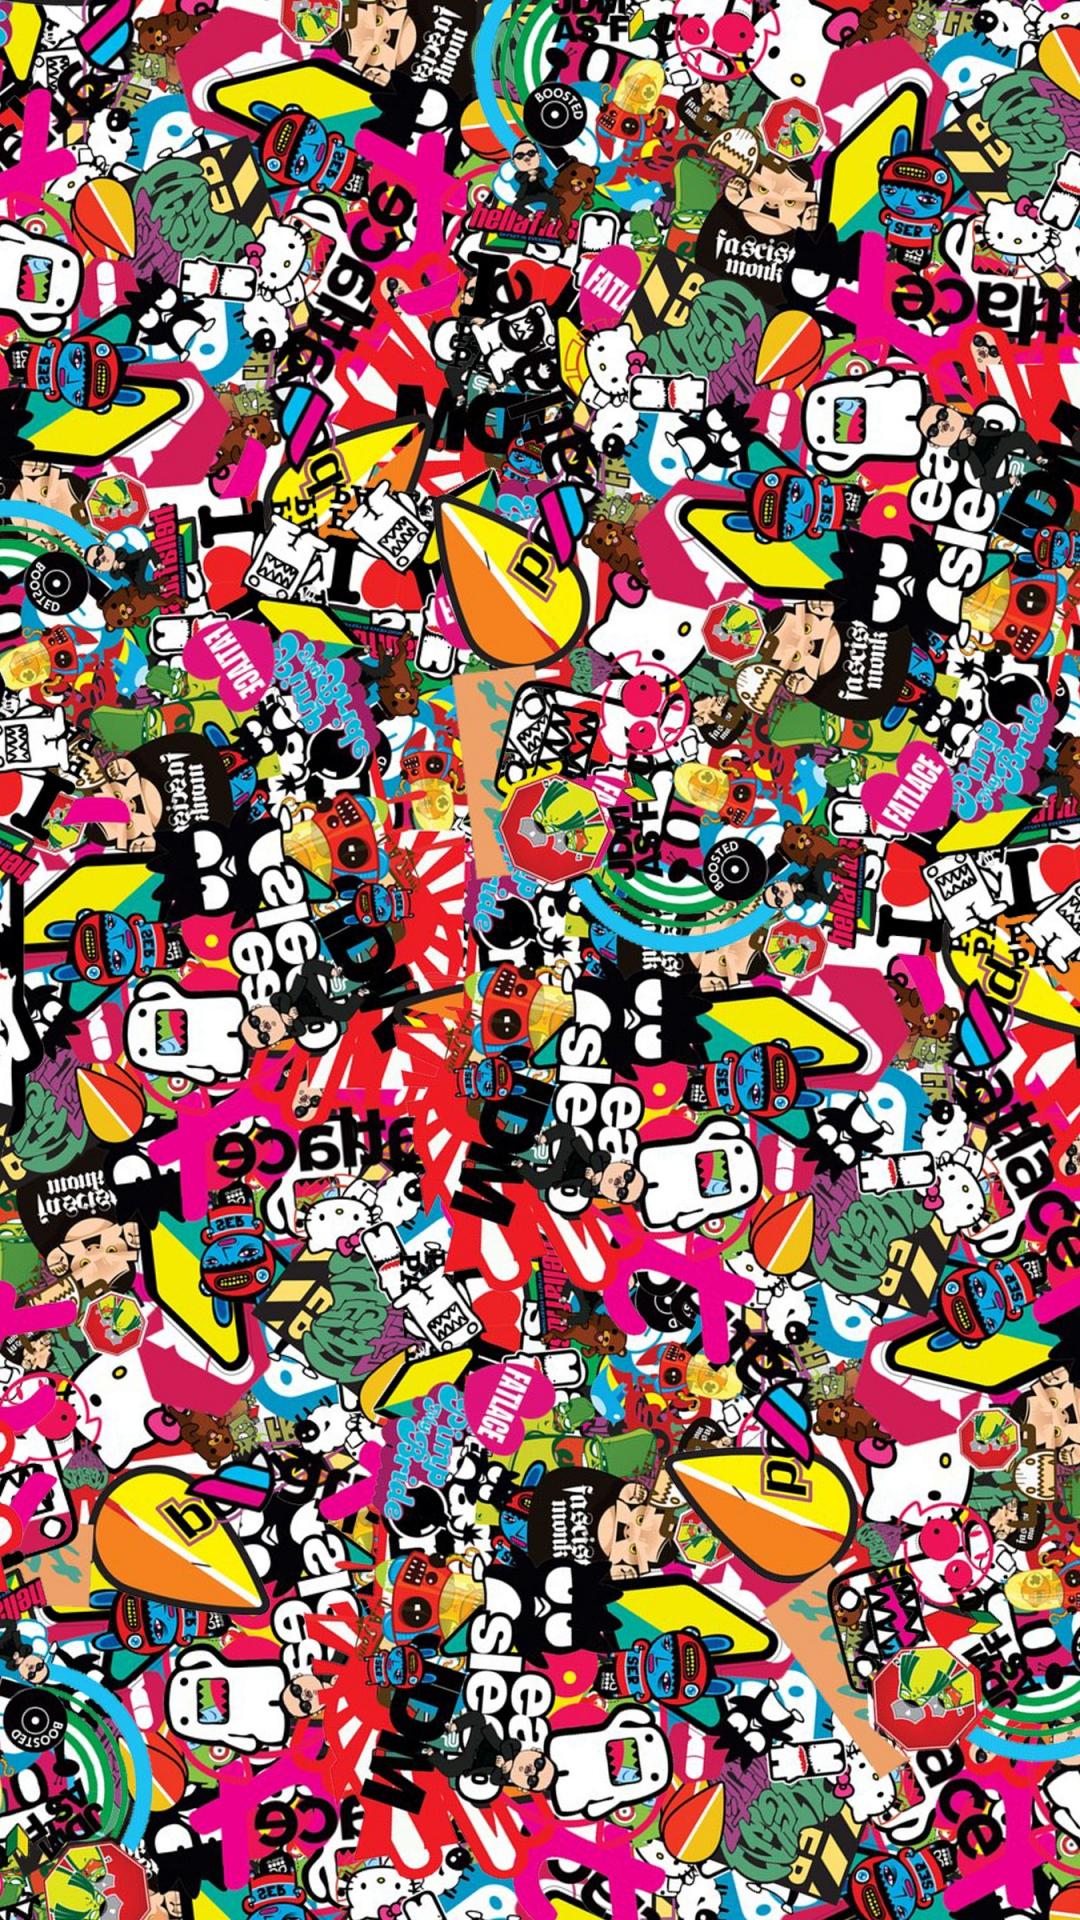 Jdm Background Style Sticker Texture Wallpaper   1080x1920 1080x1920